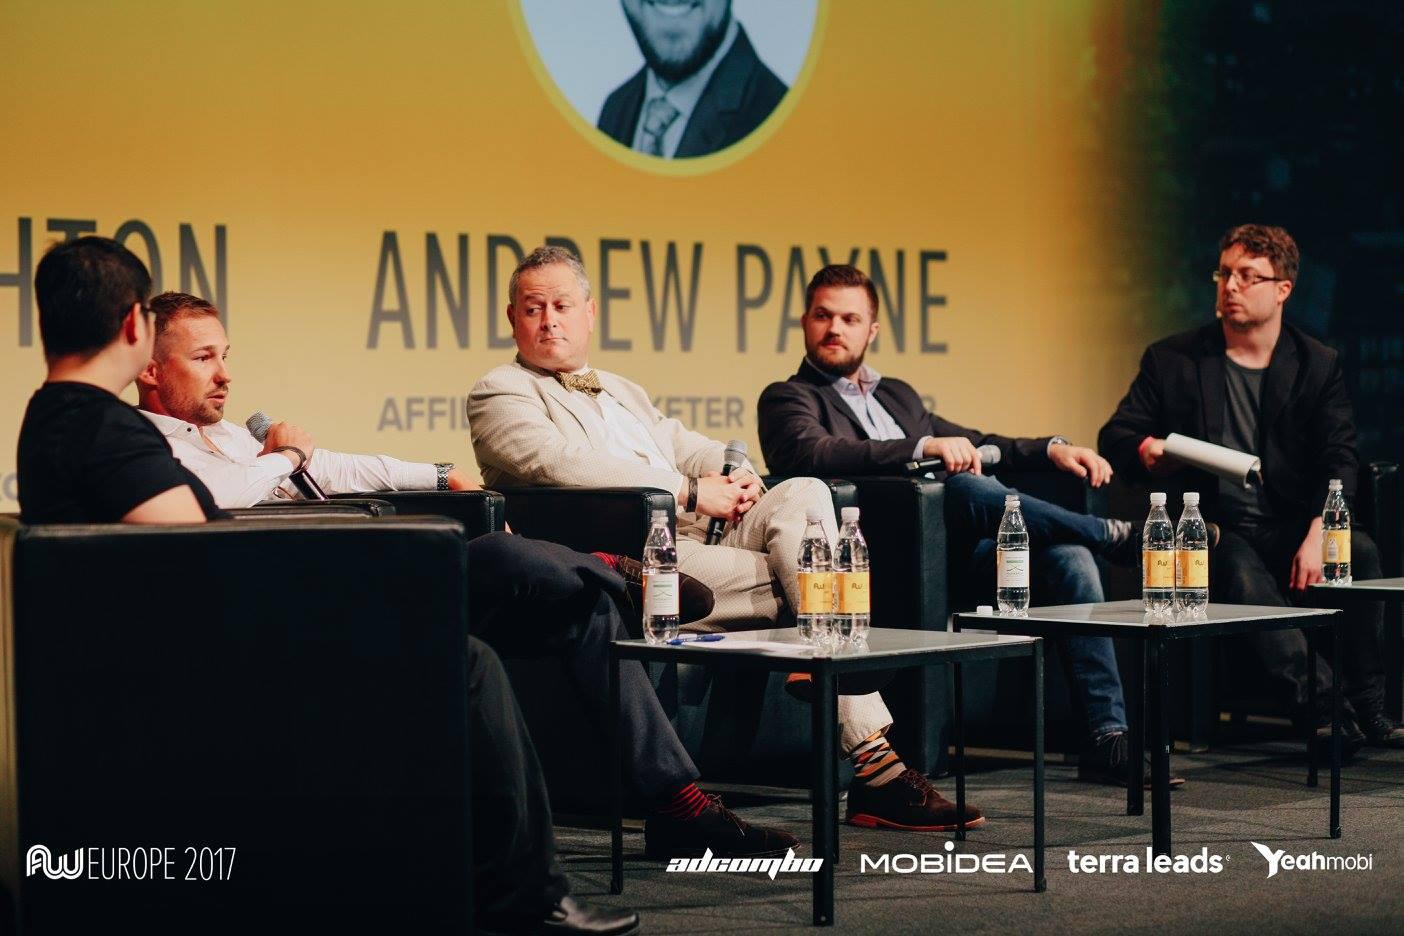 Andrew Payne - AWE 2017